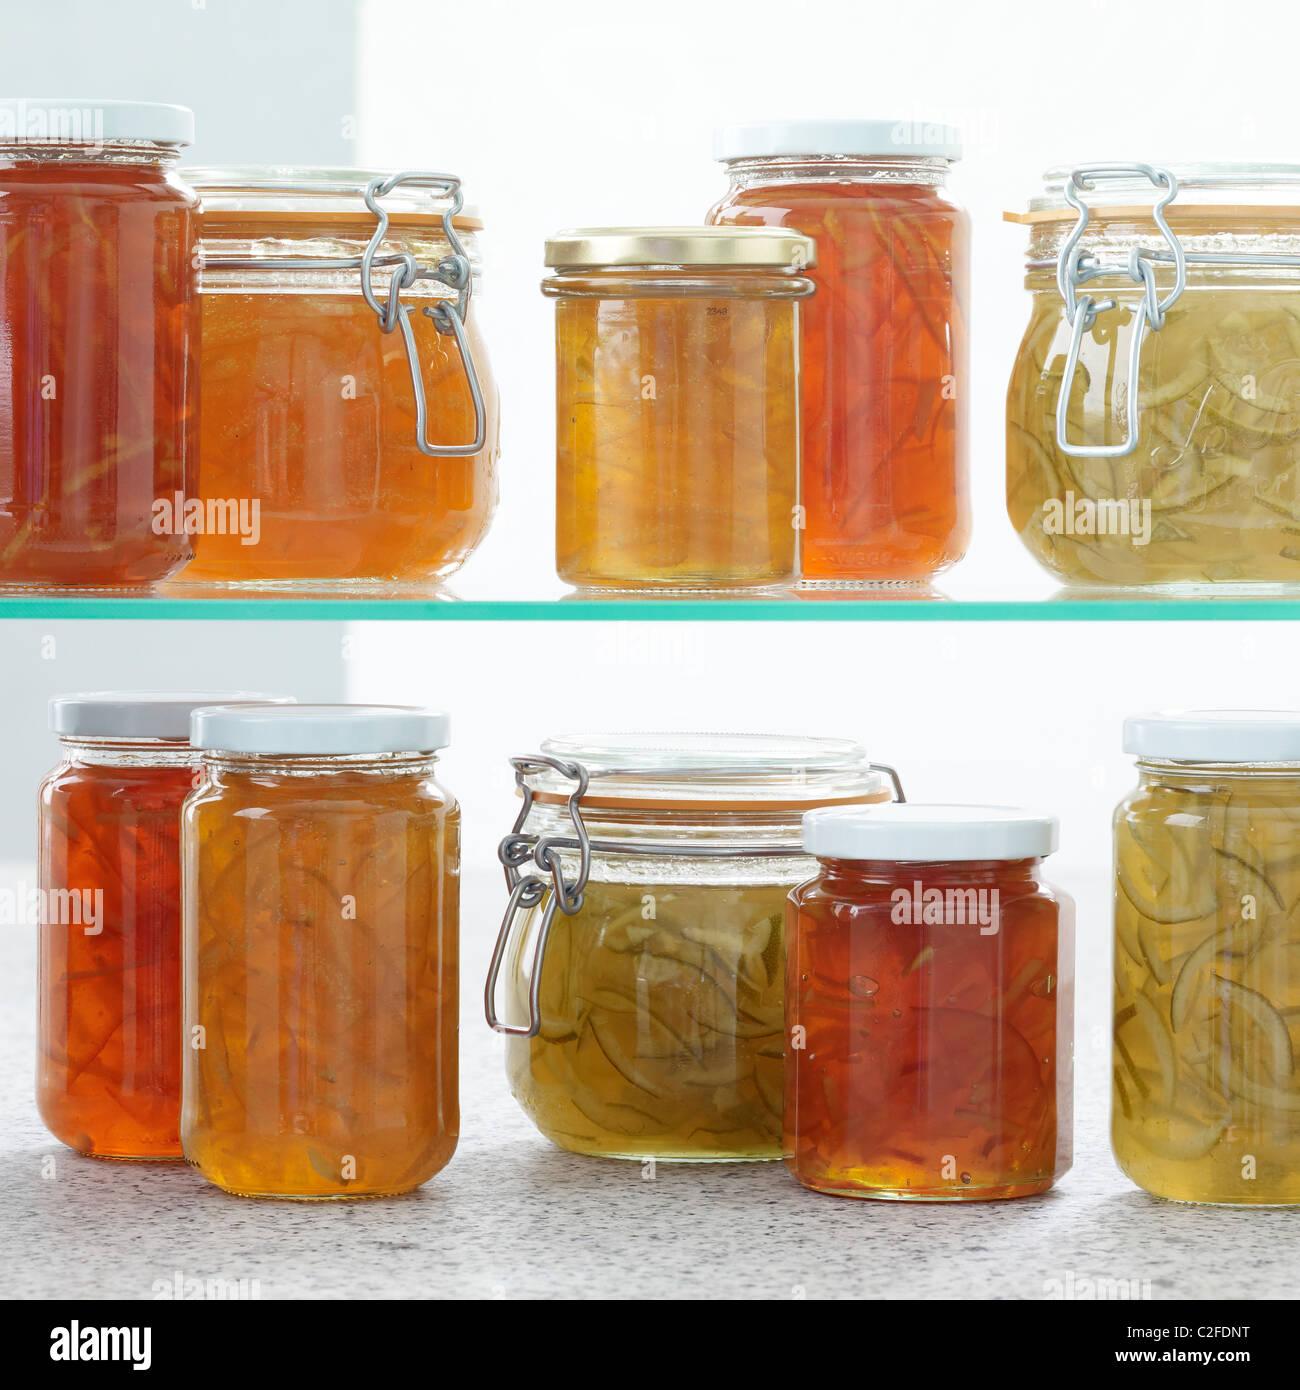 Home made marmalade jars on glass shelf - Stock Image